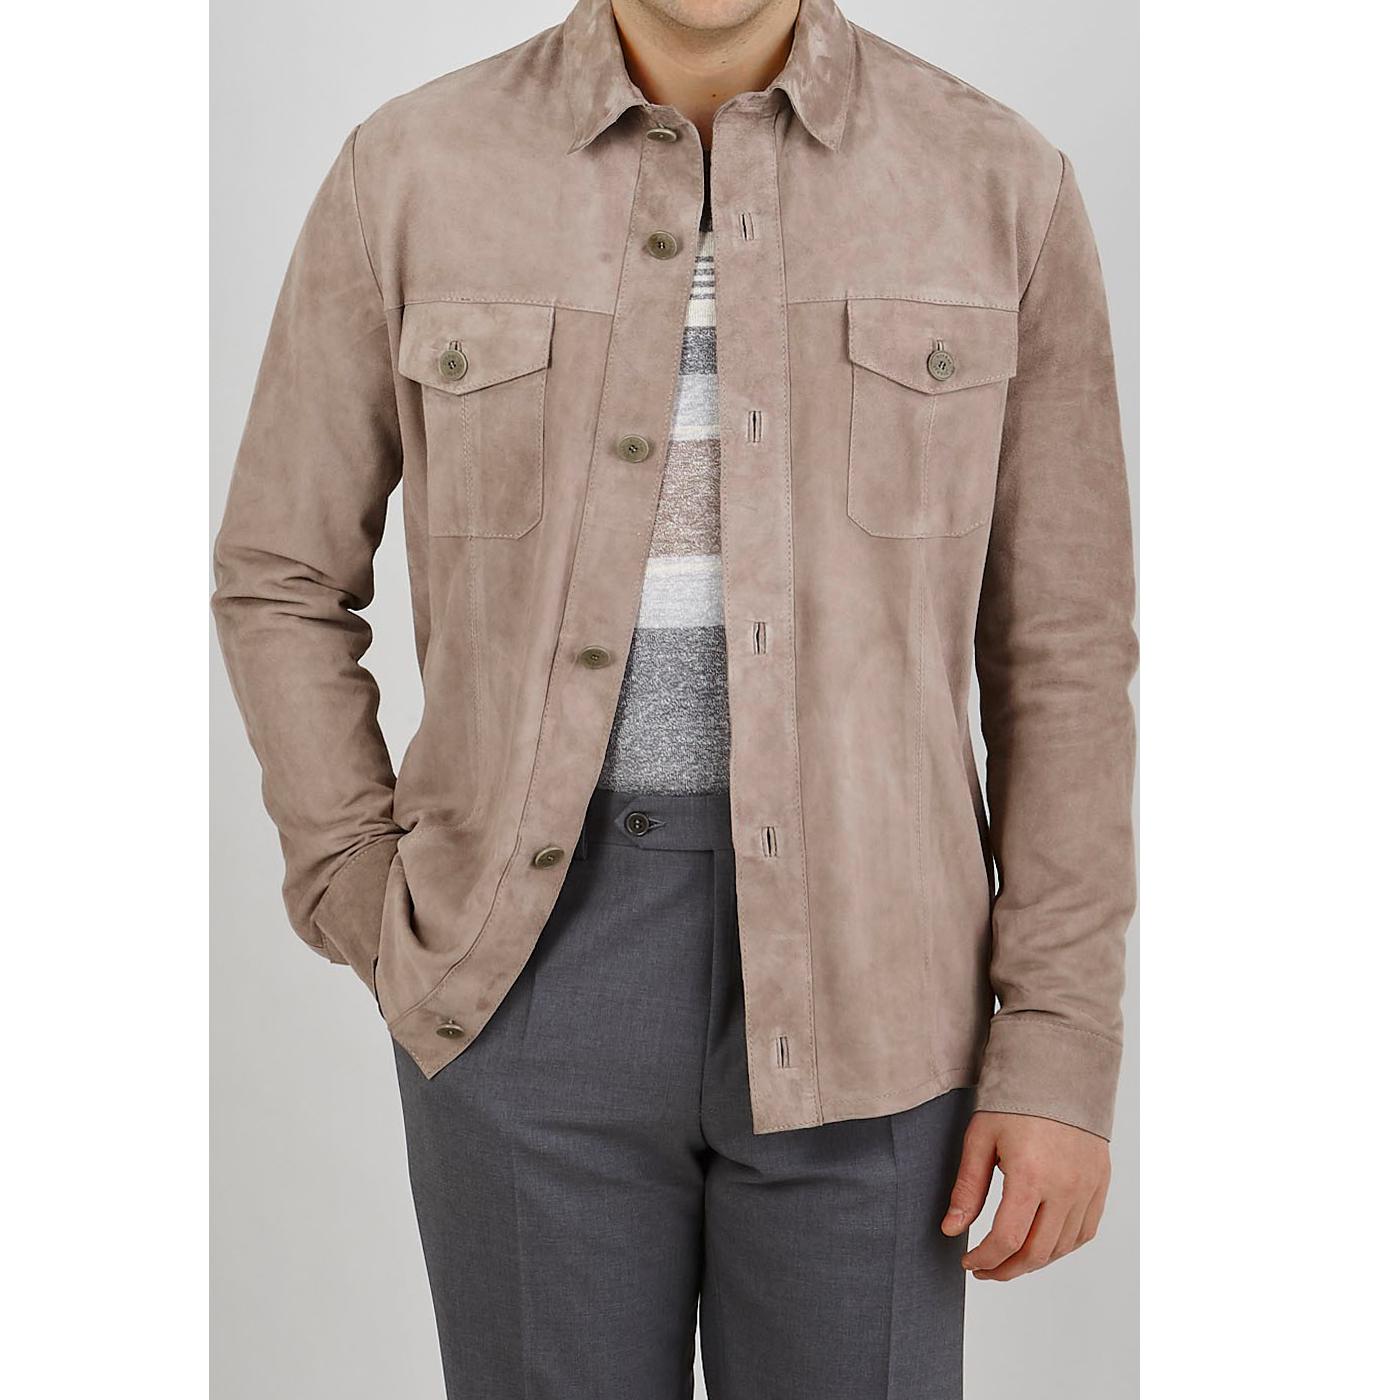 Torras Mushroom Suede Leather Overshirt Front